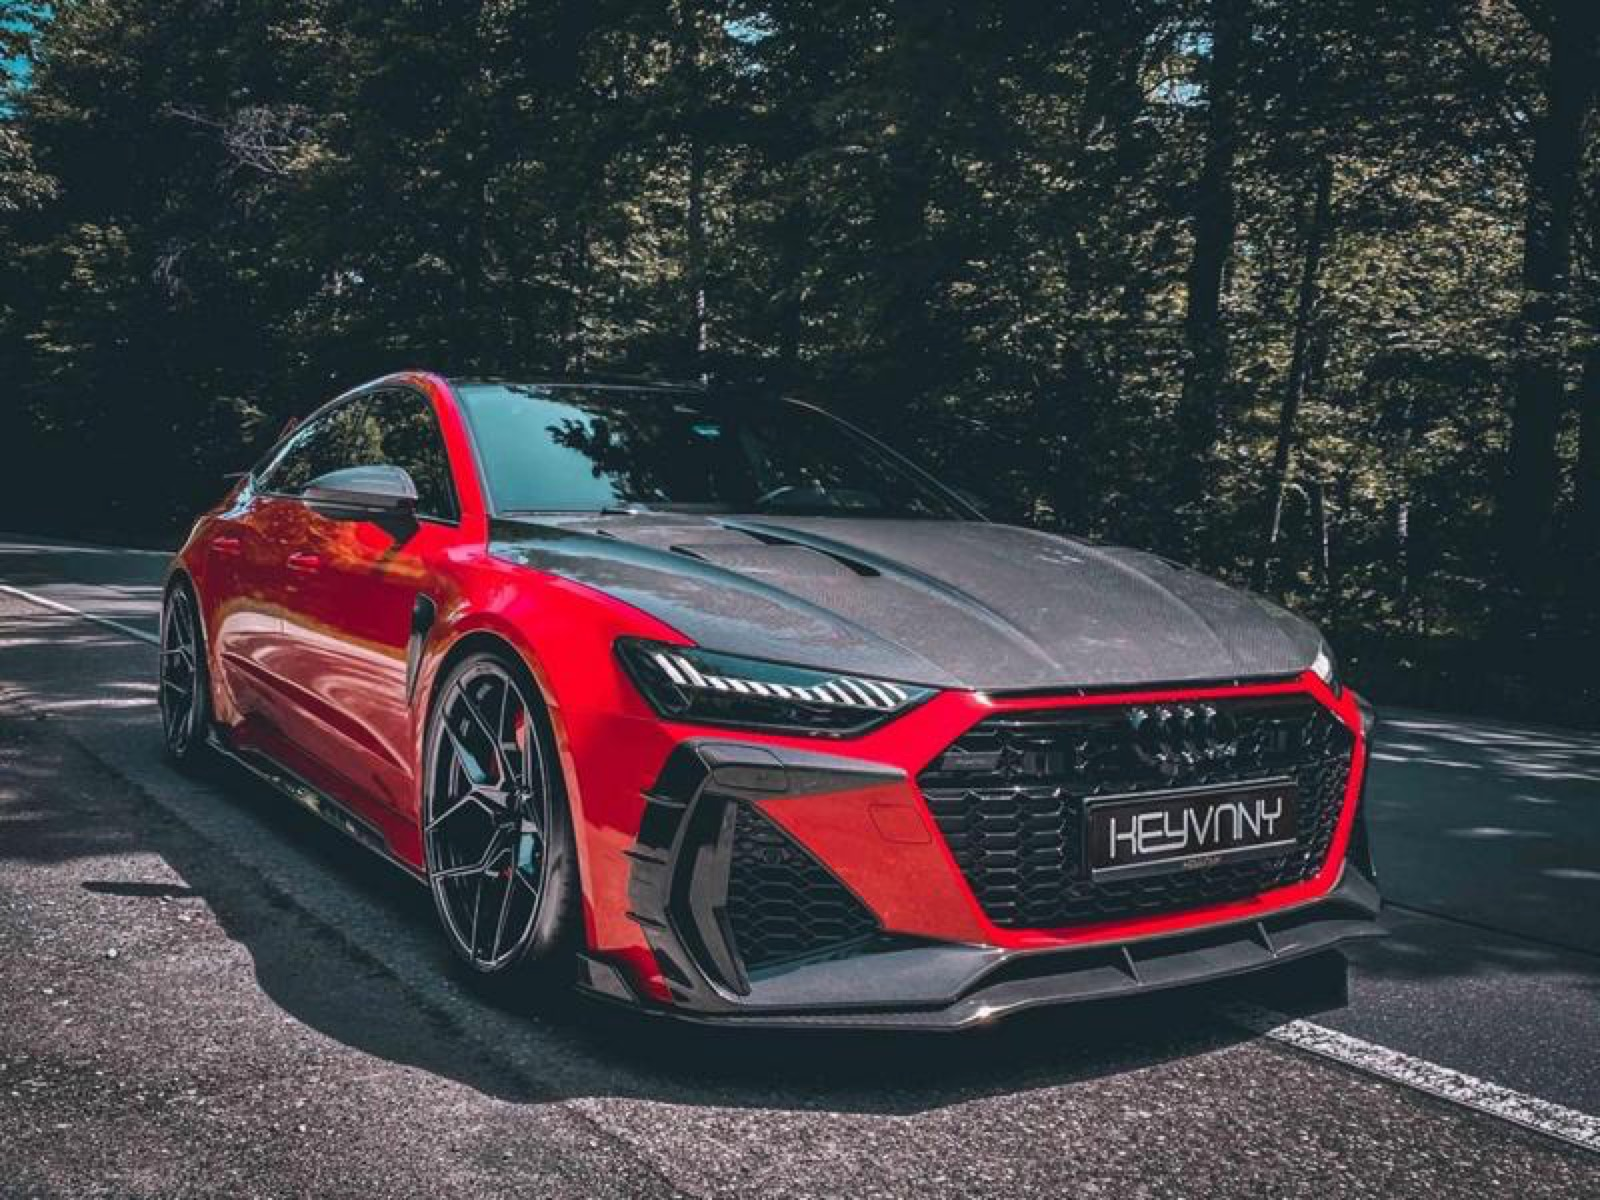 Audi-RS7-by-Keyvany-4